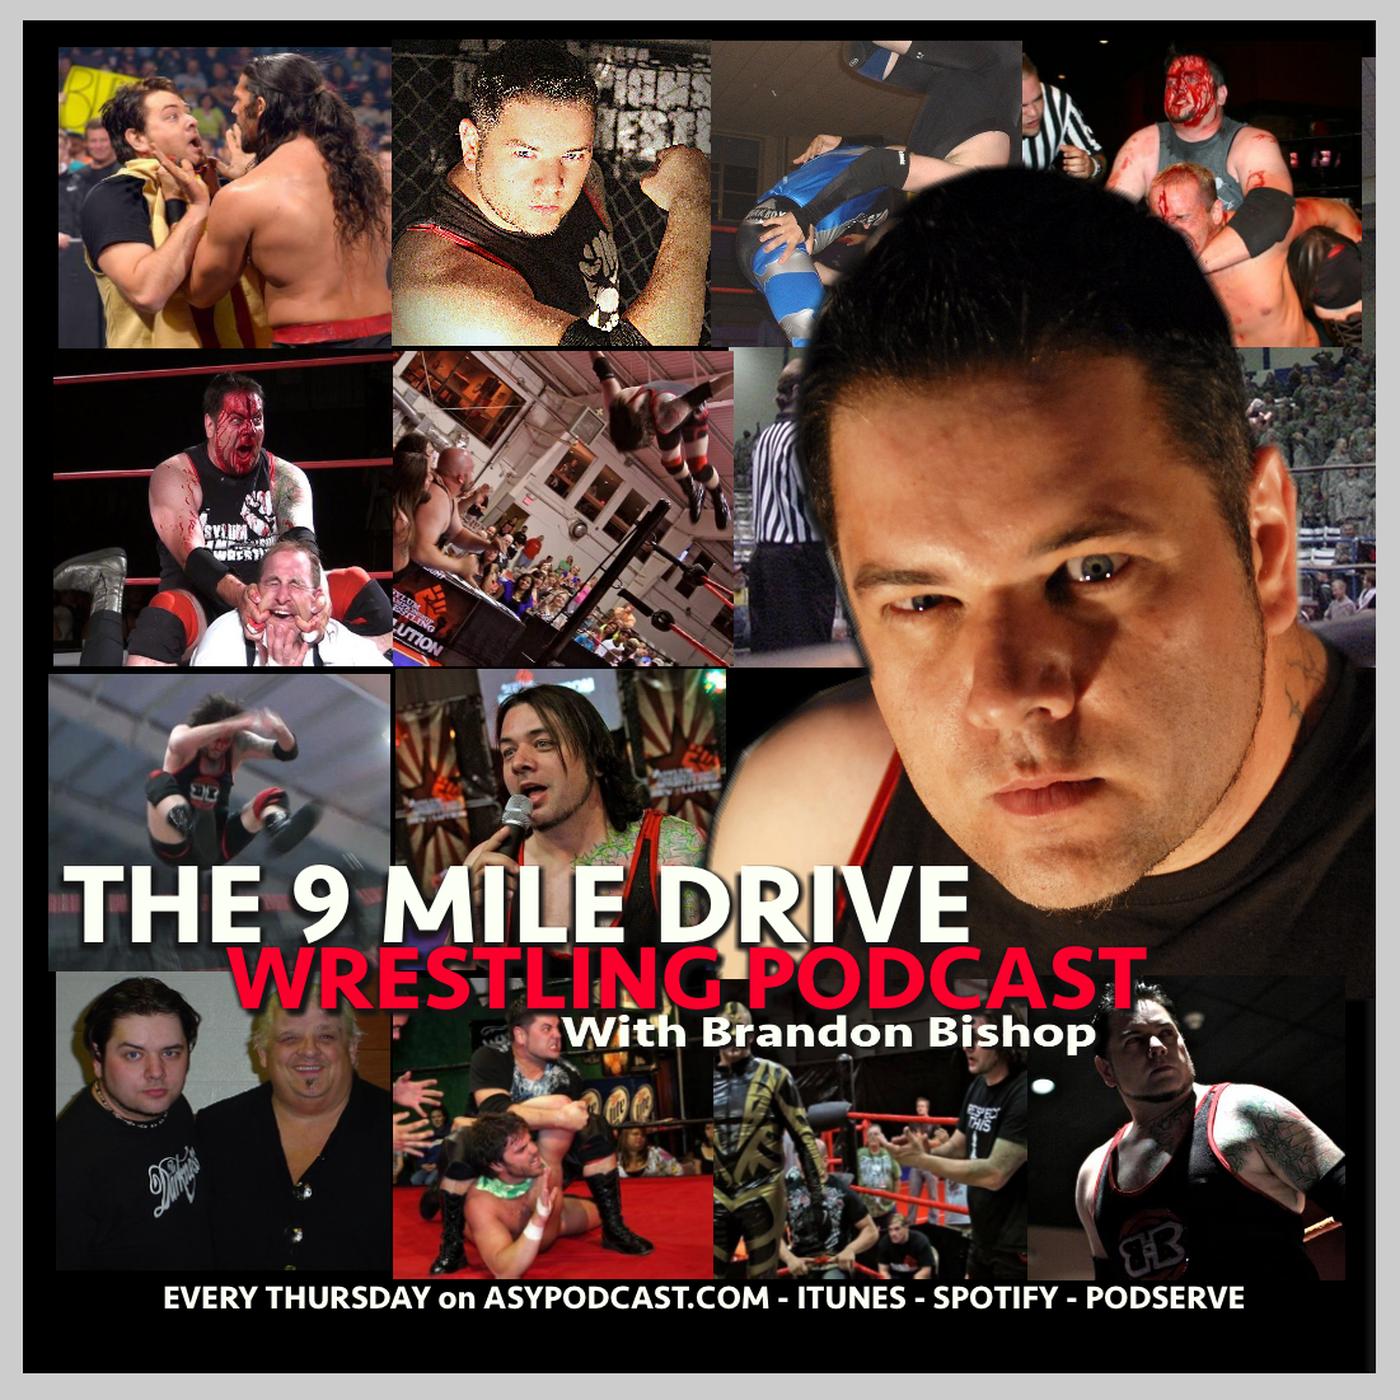 THE 9 MILE DRIVE WRESTLING PODCAST W/Brandon Bishop